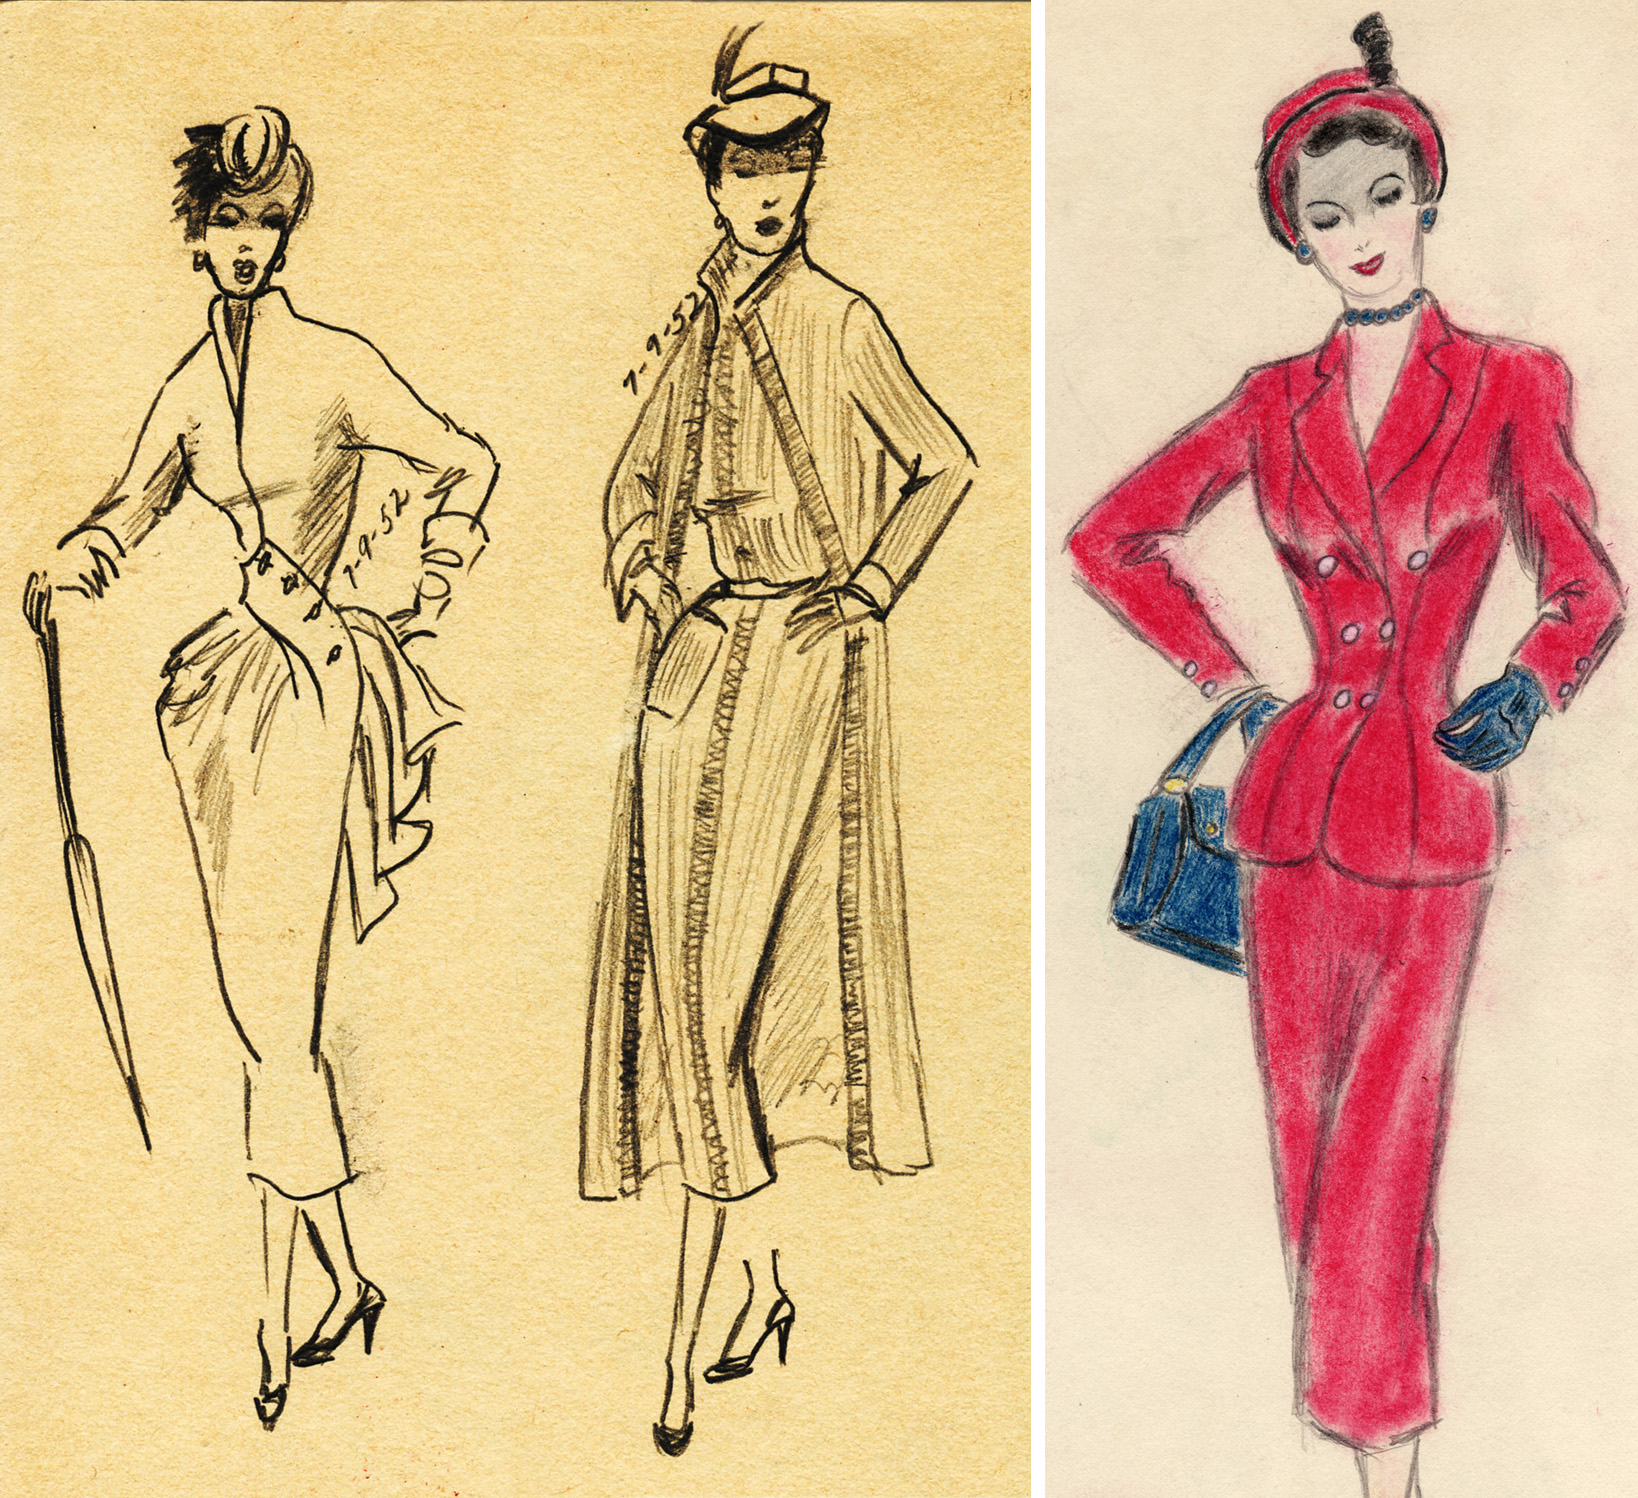 1950s fashion figures